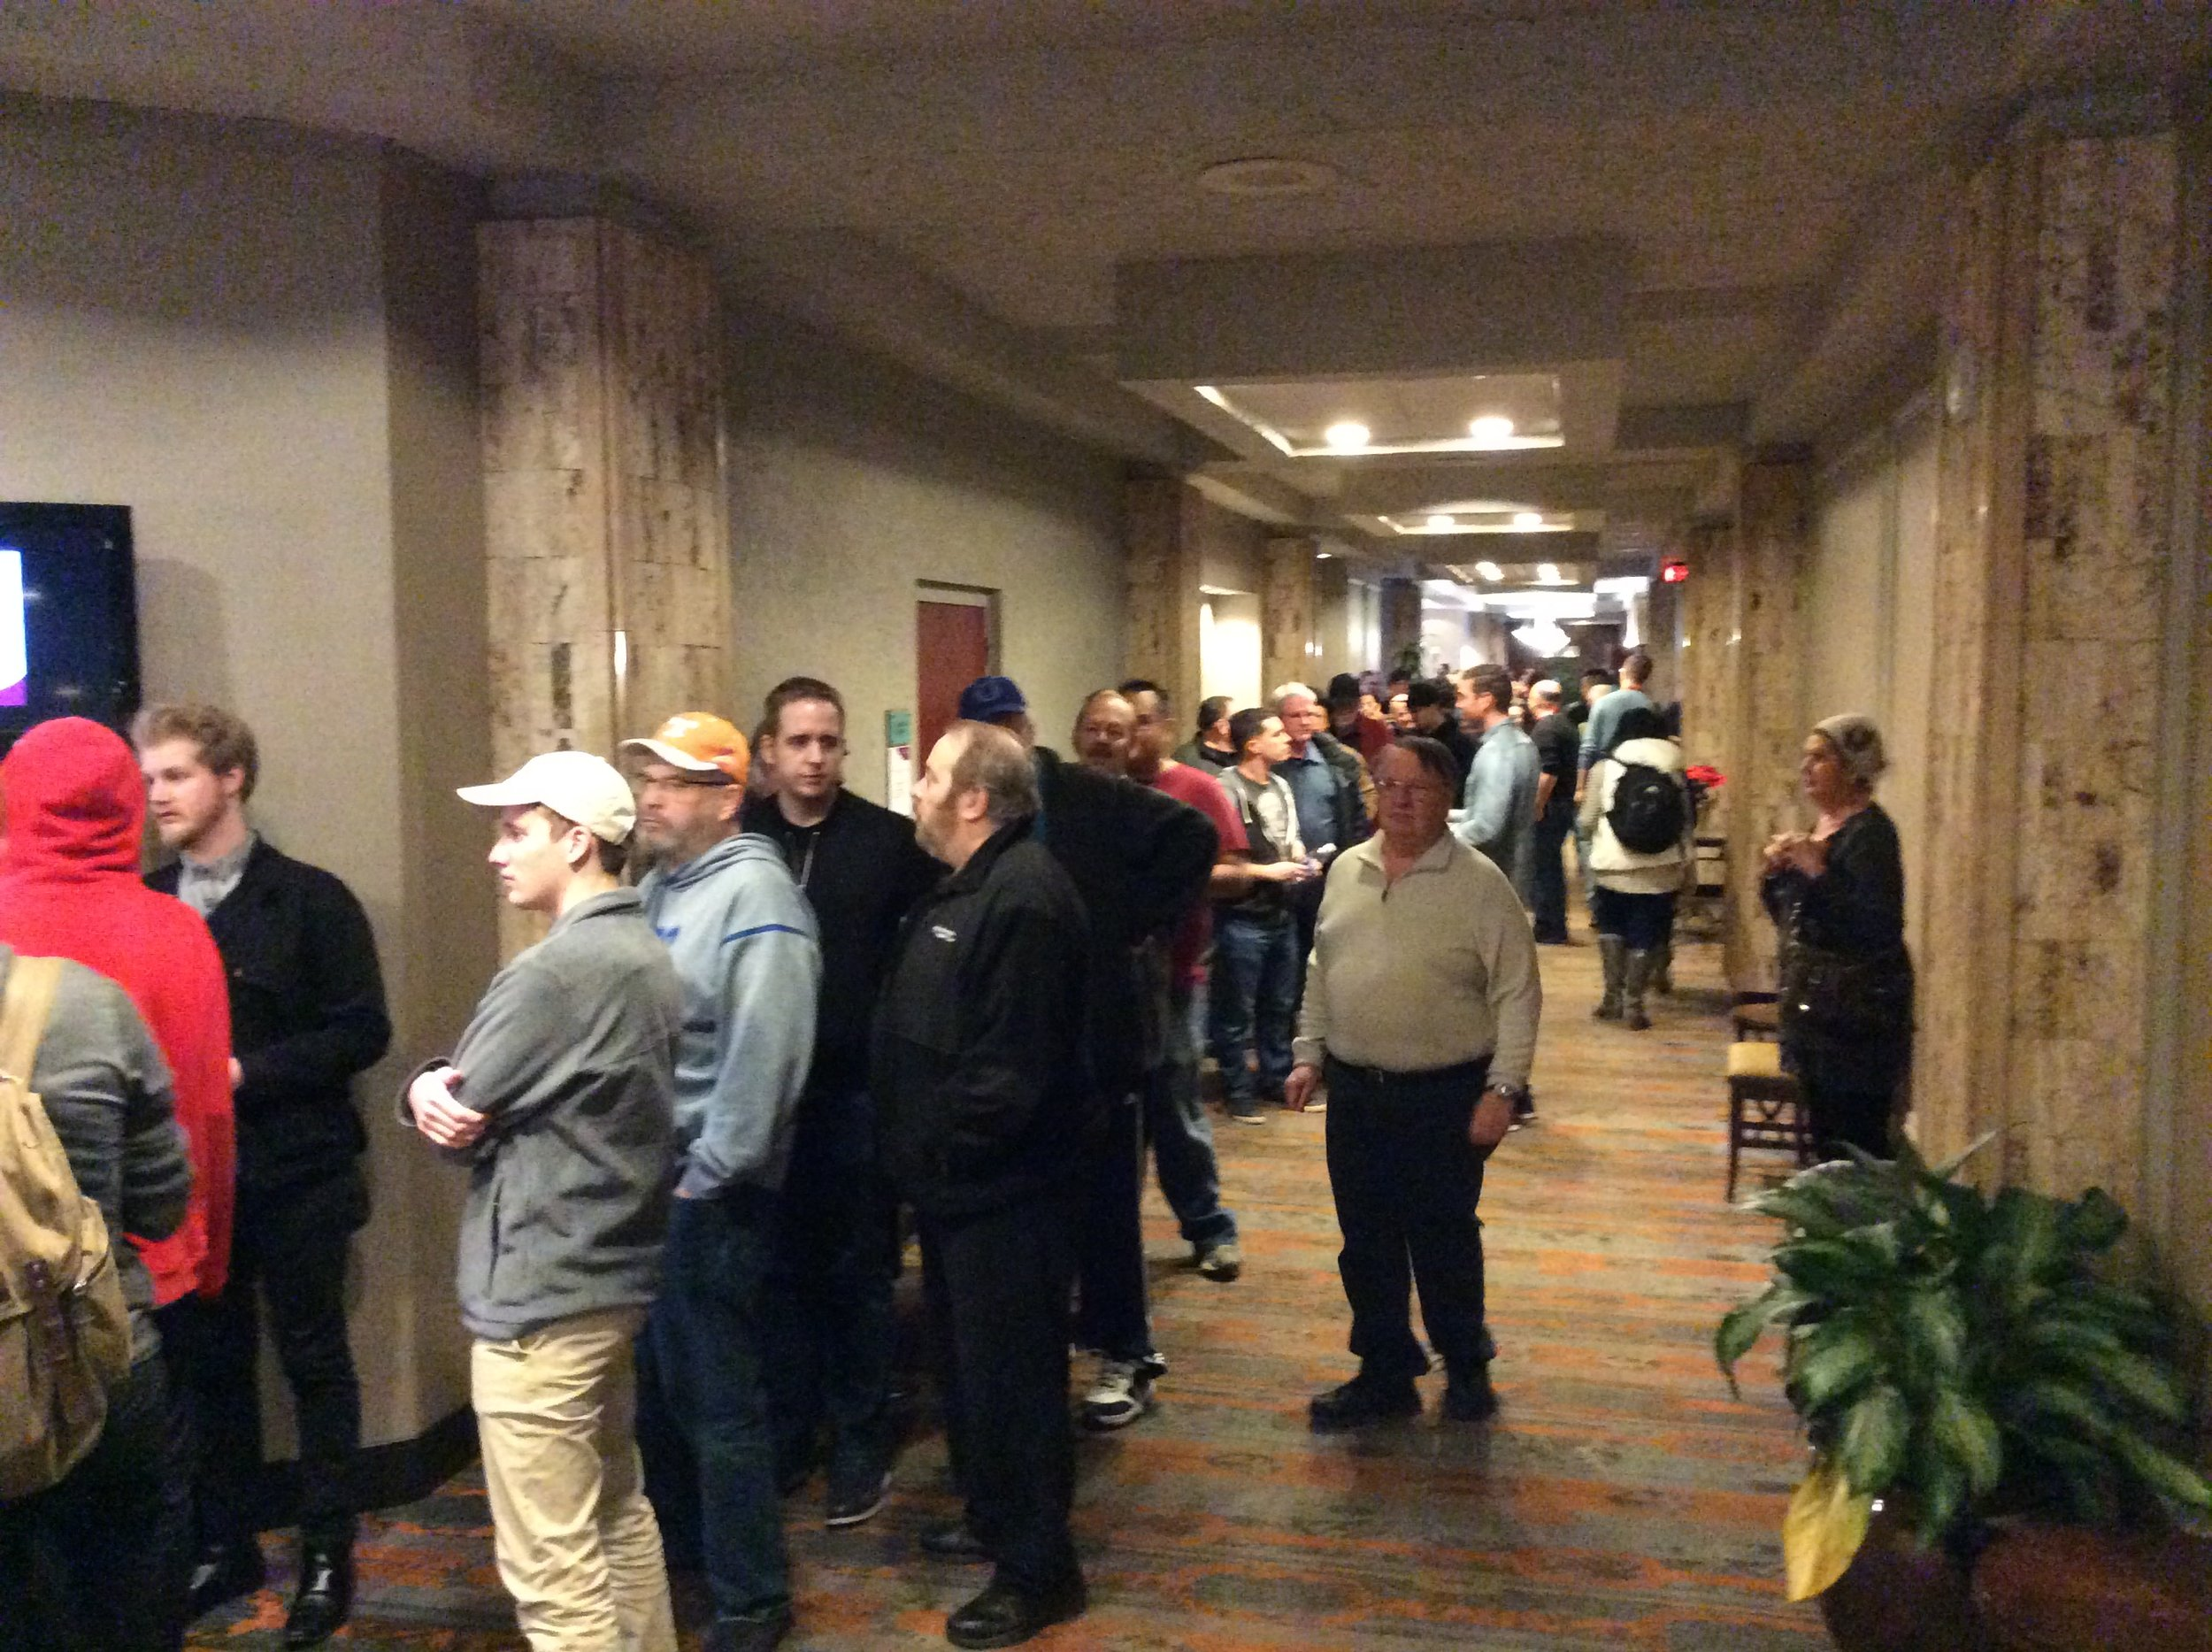 Convention registration line